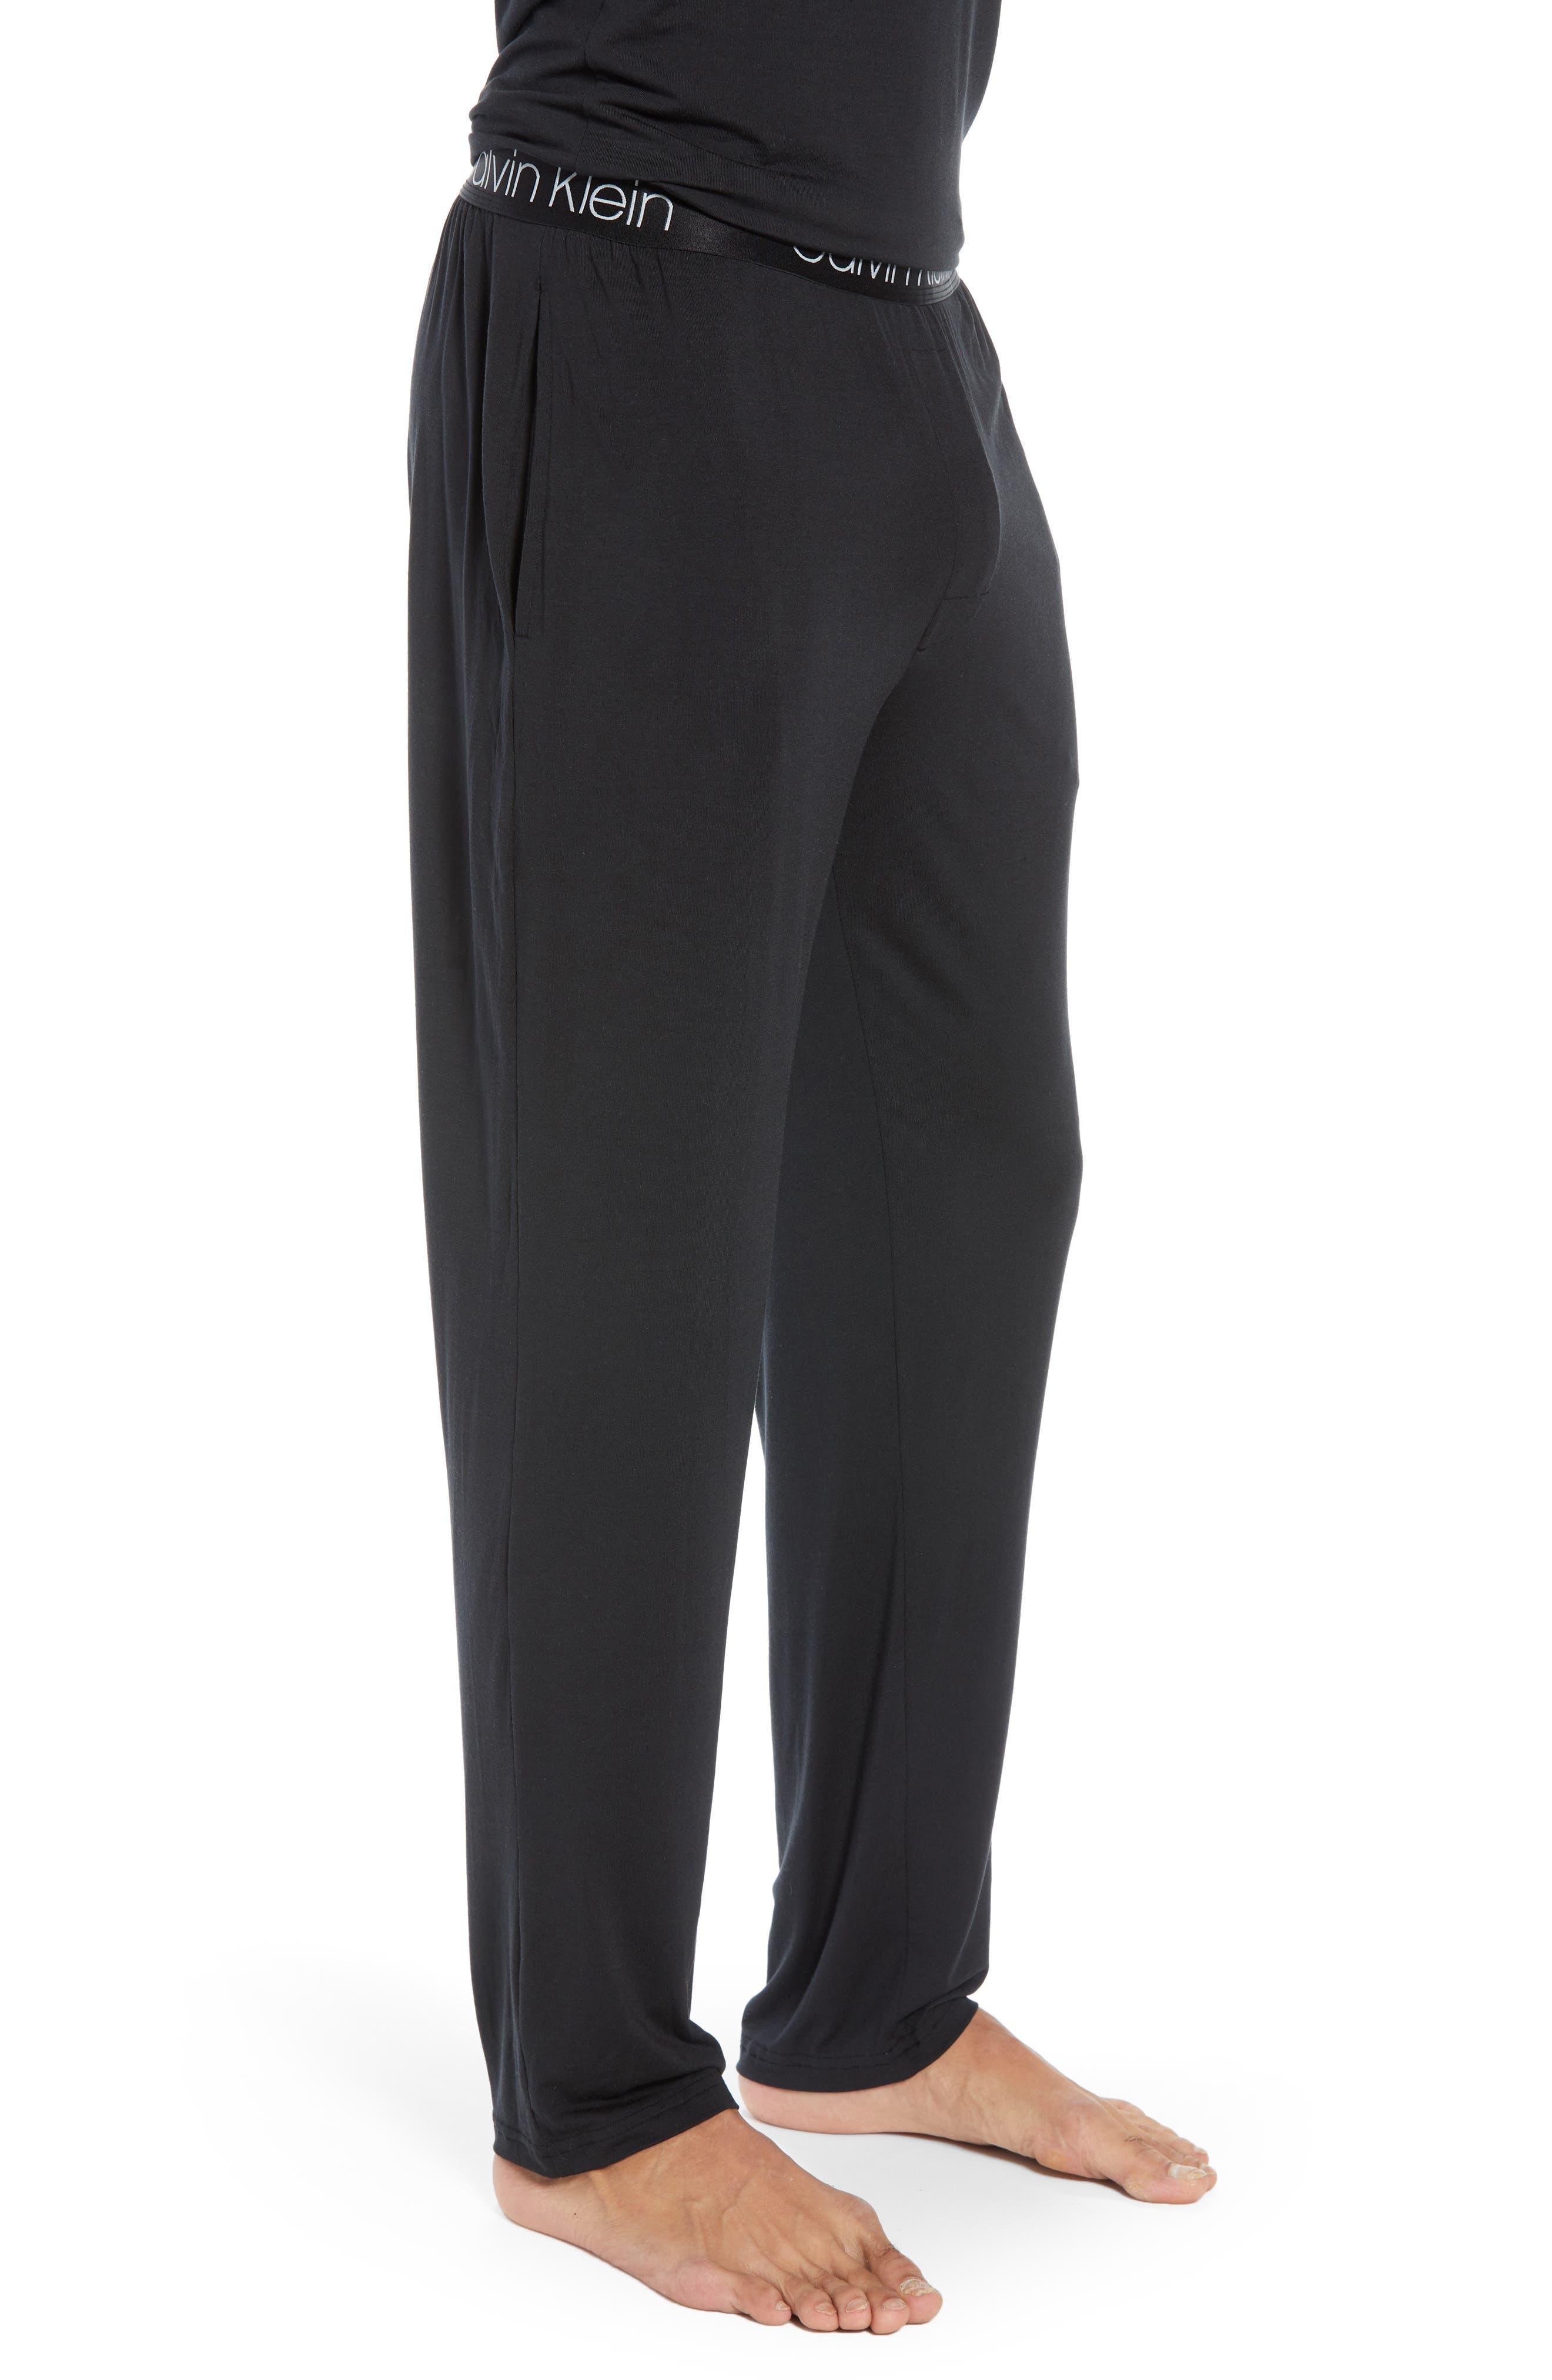 CALVIN KLEIN, Stretch Modal Lounge Pants, Alternate thumbnail 3, color, BLACK